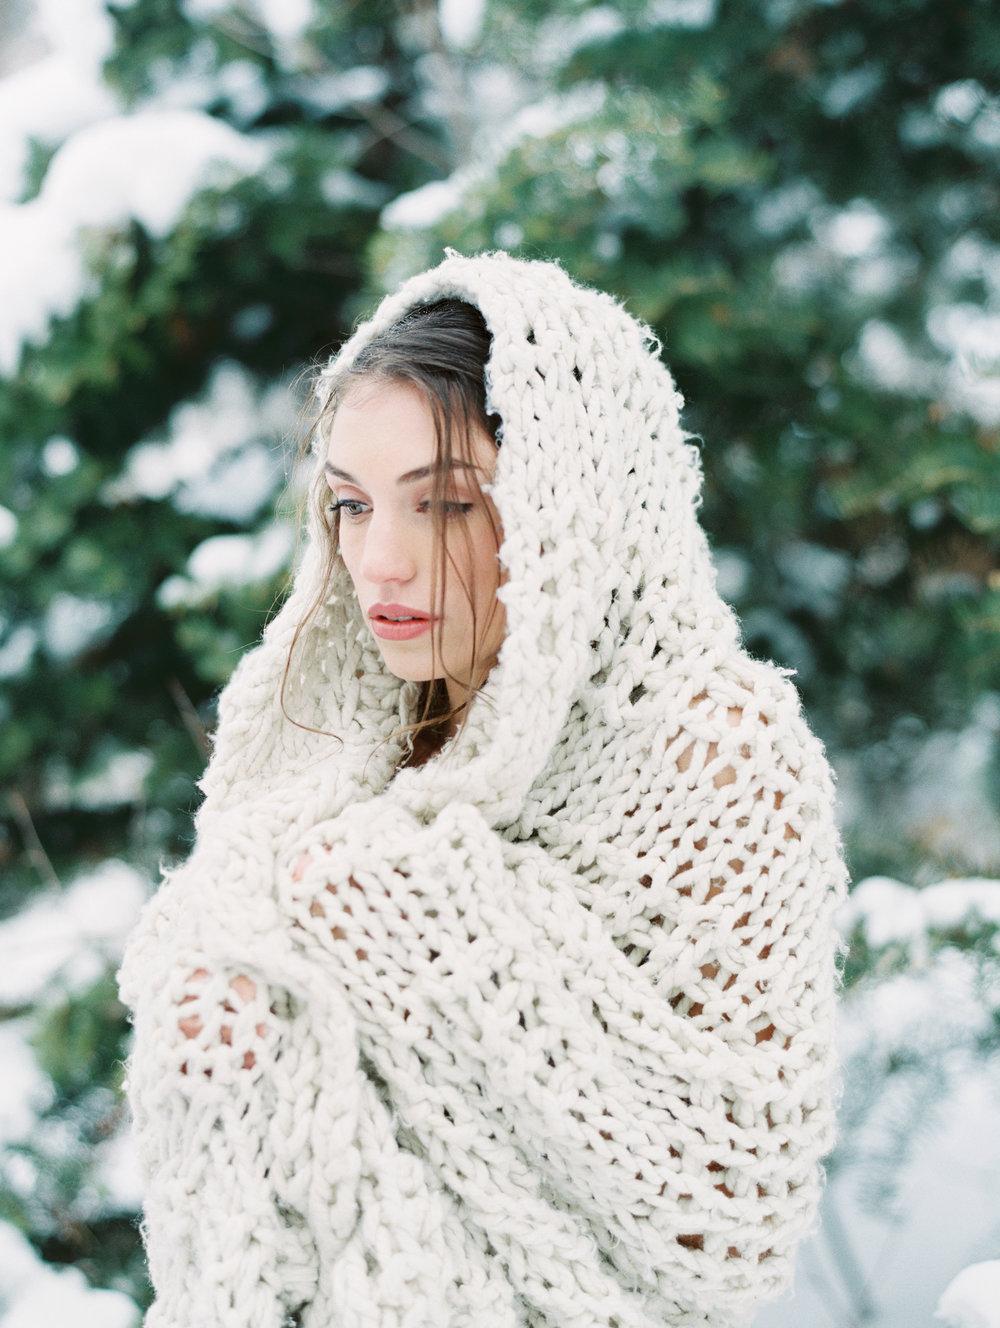 BellaCosa_WinterWonderland-55.jpg